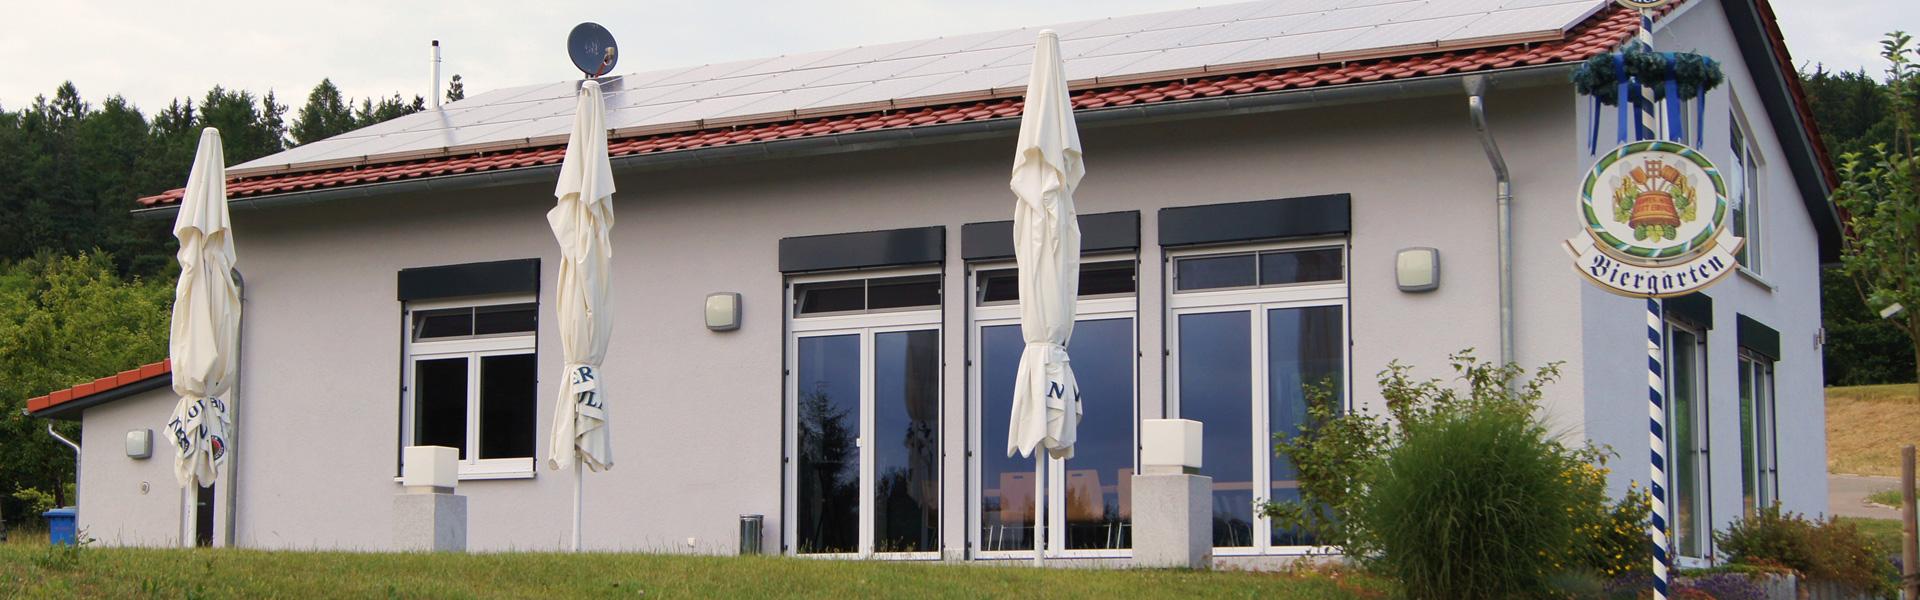 titelbild-dorfhaus